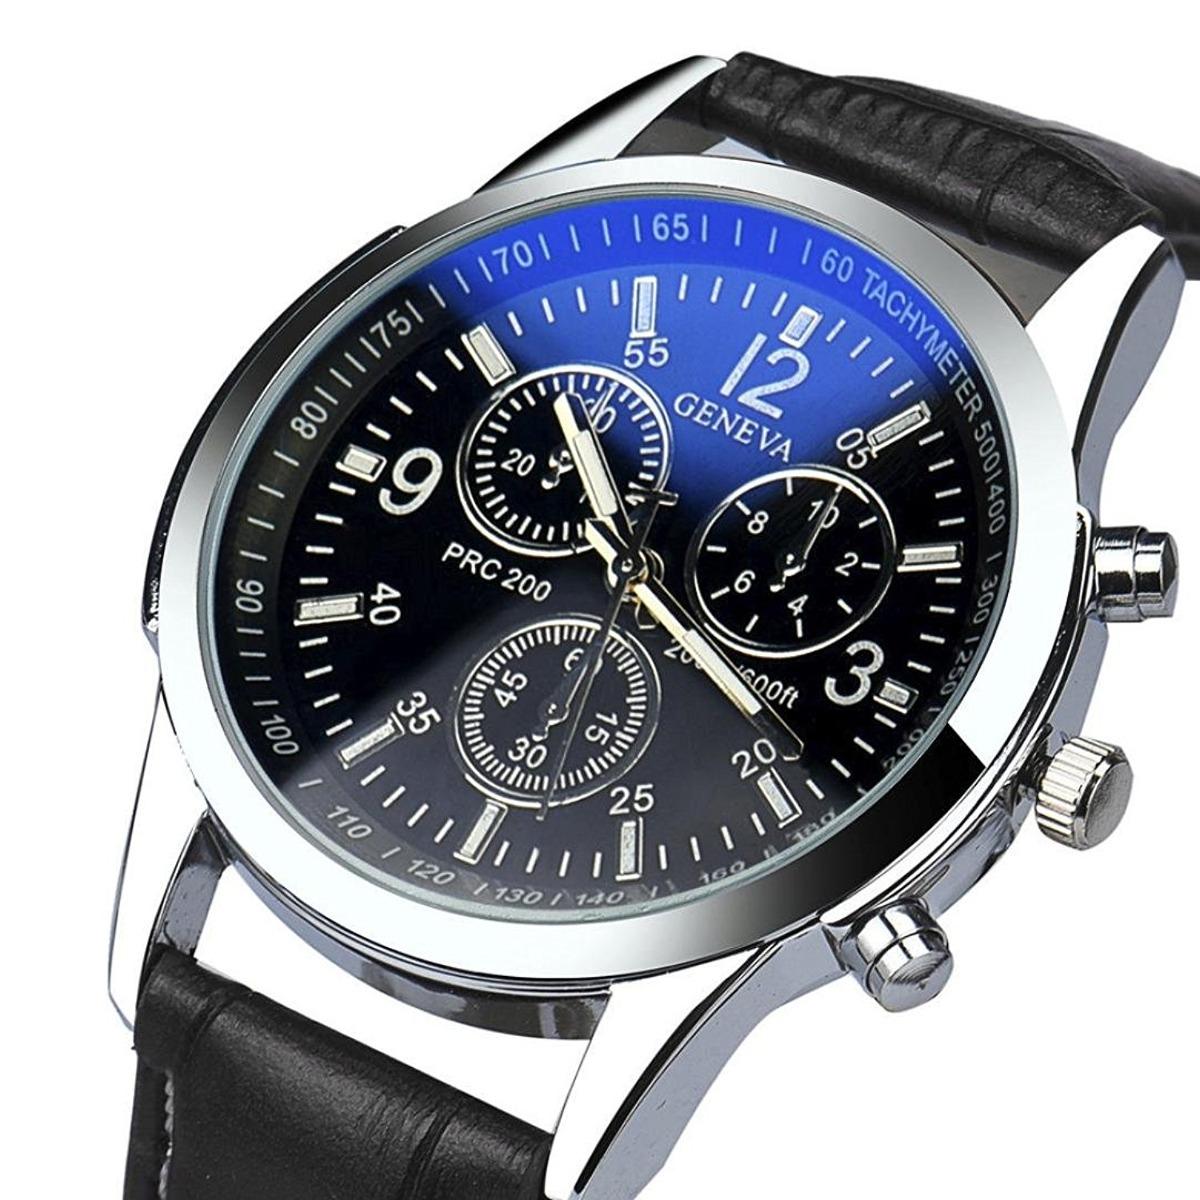 7239470359a relógio masculino geneva pulso clássico frete grátis barato. Carregando  zoom.